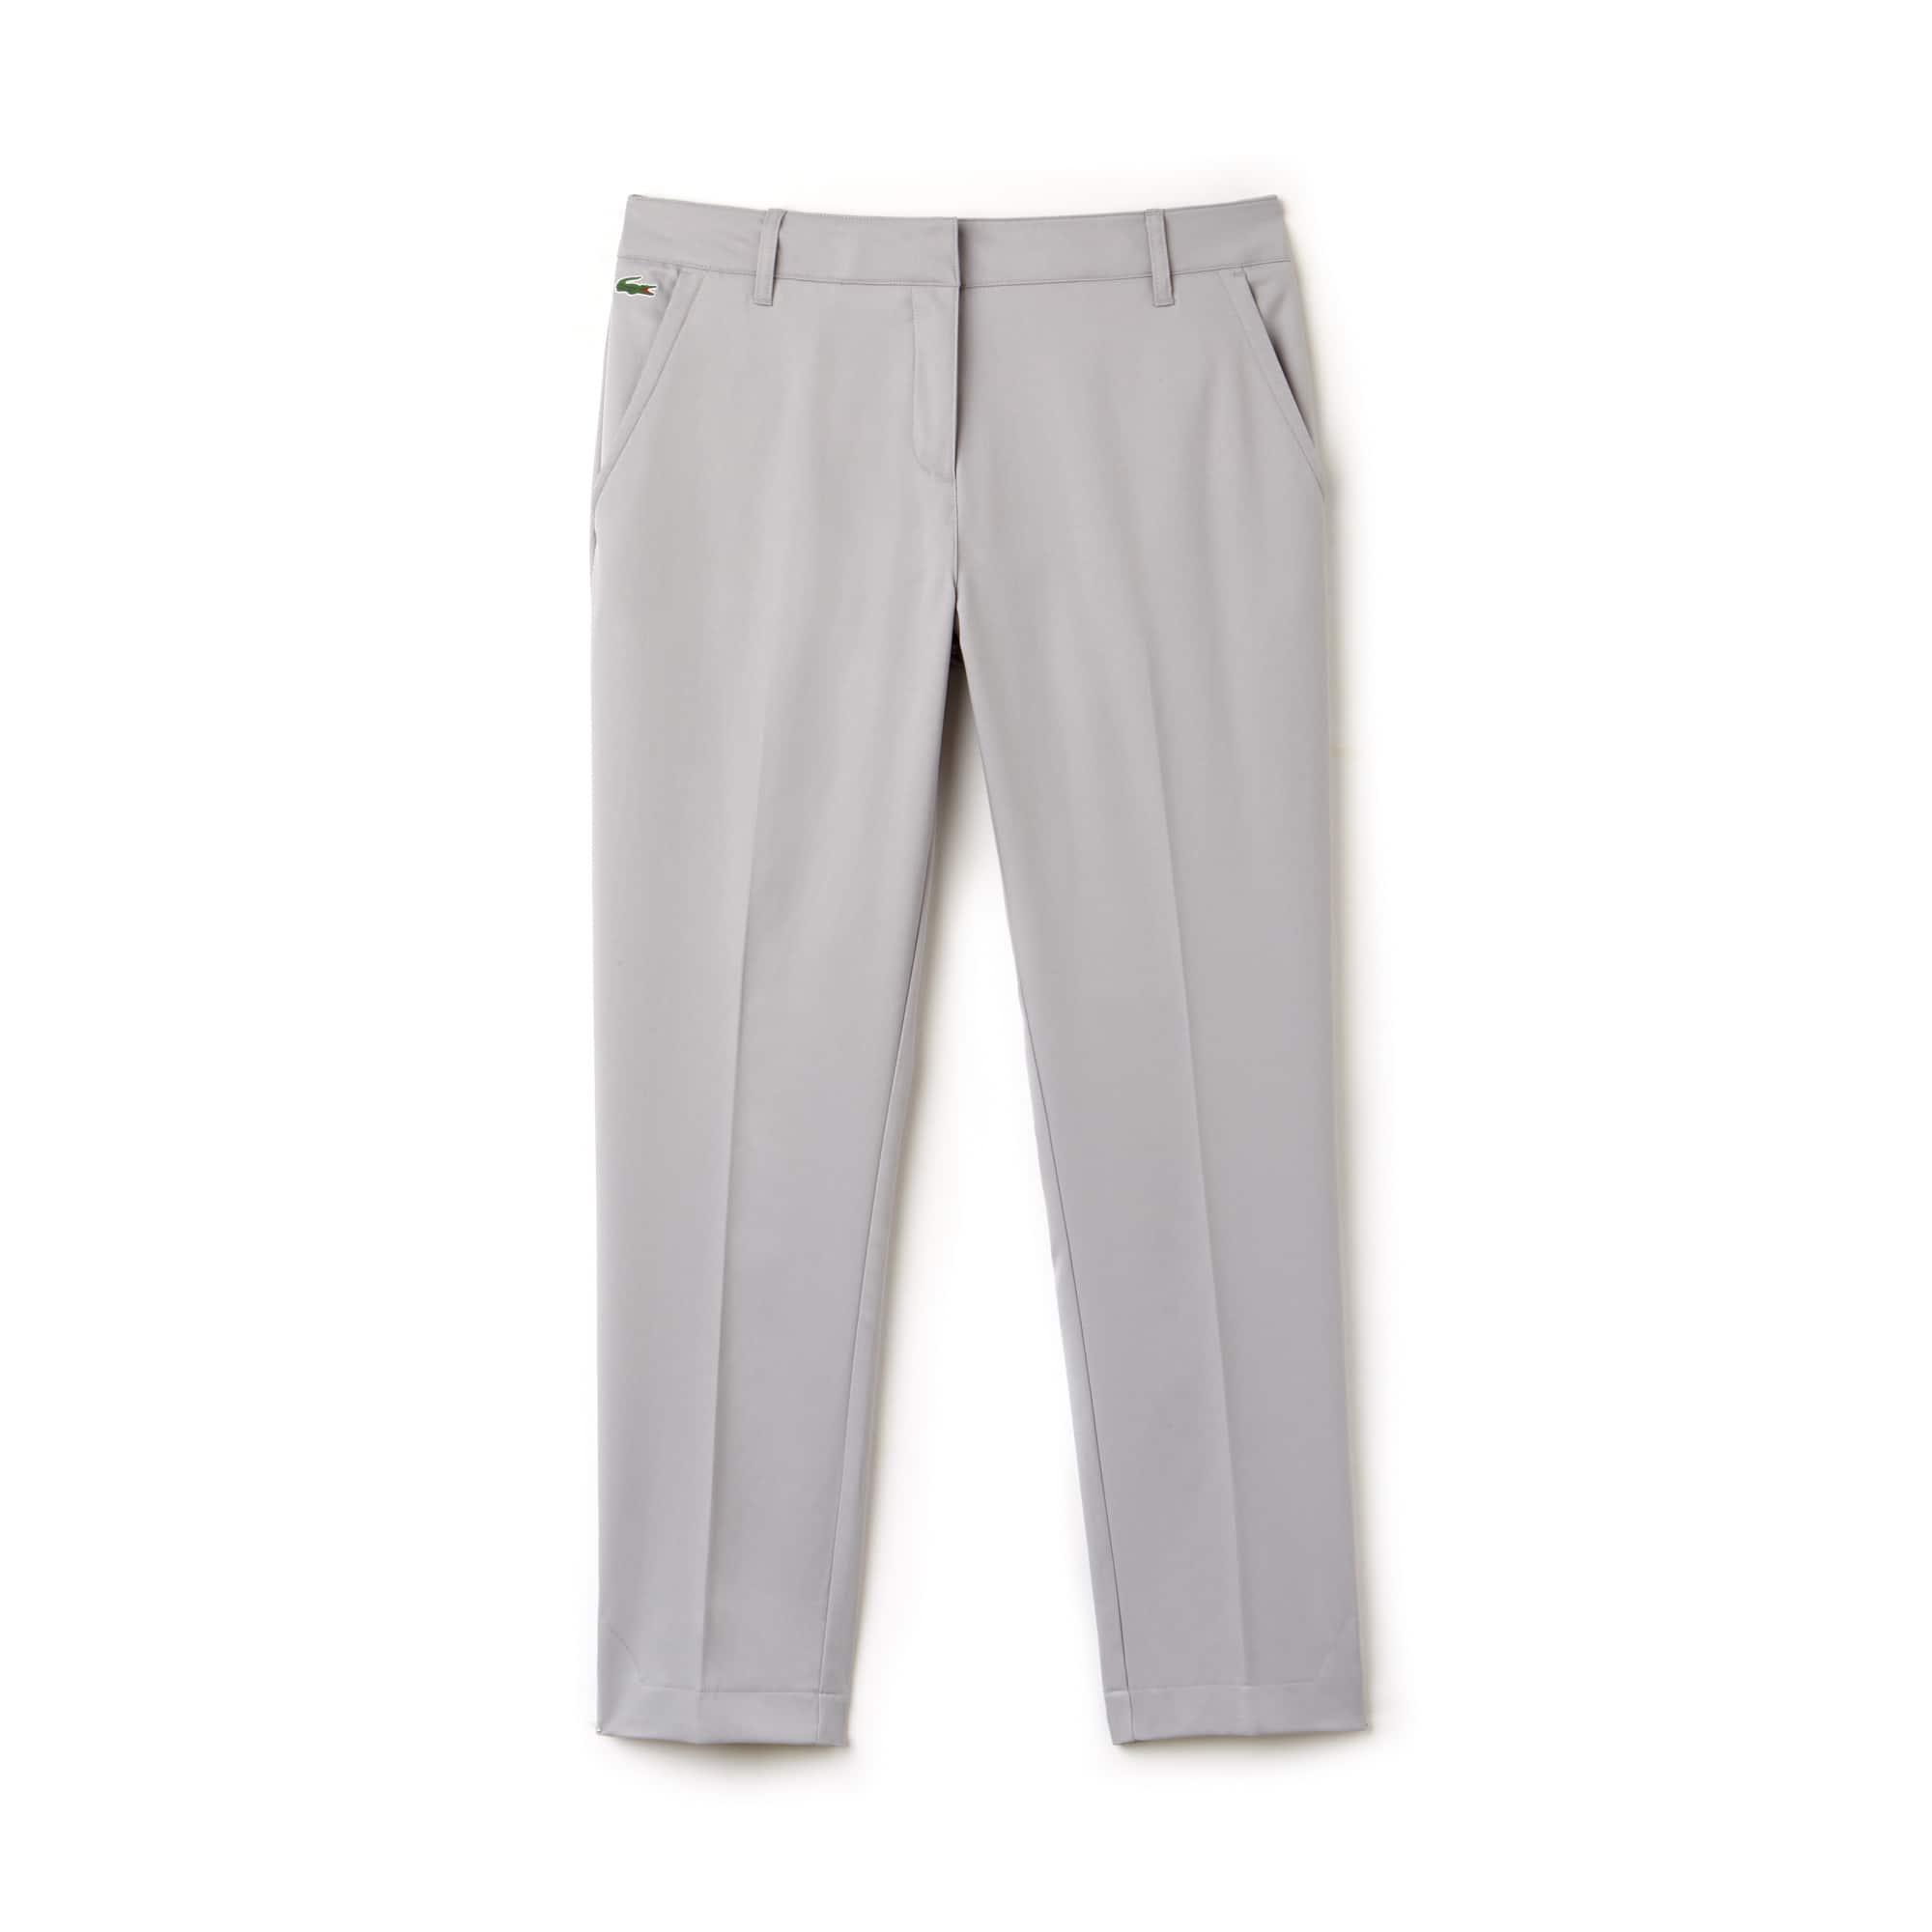 Pantaloni con pince Golf Lacoste SPORT in gabardine tecnico Edizione Ryder Cup